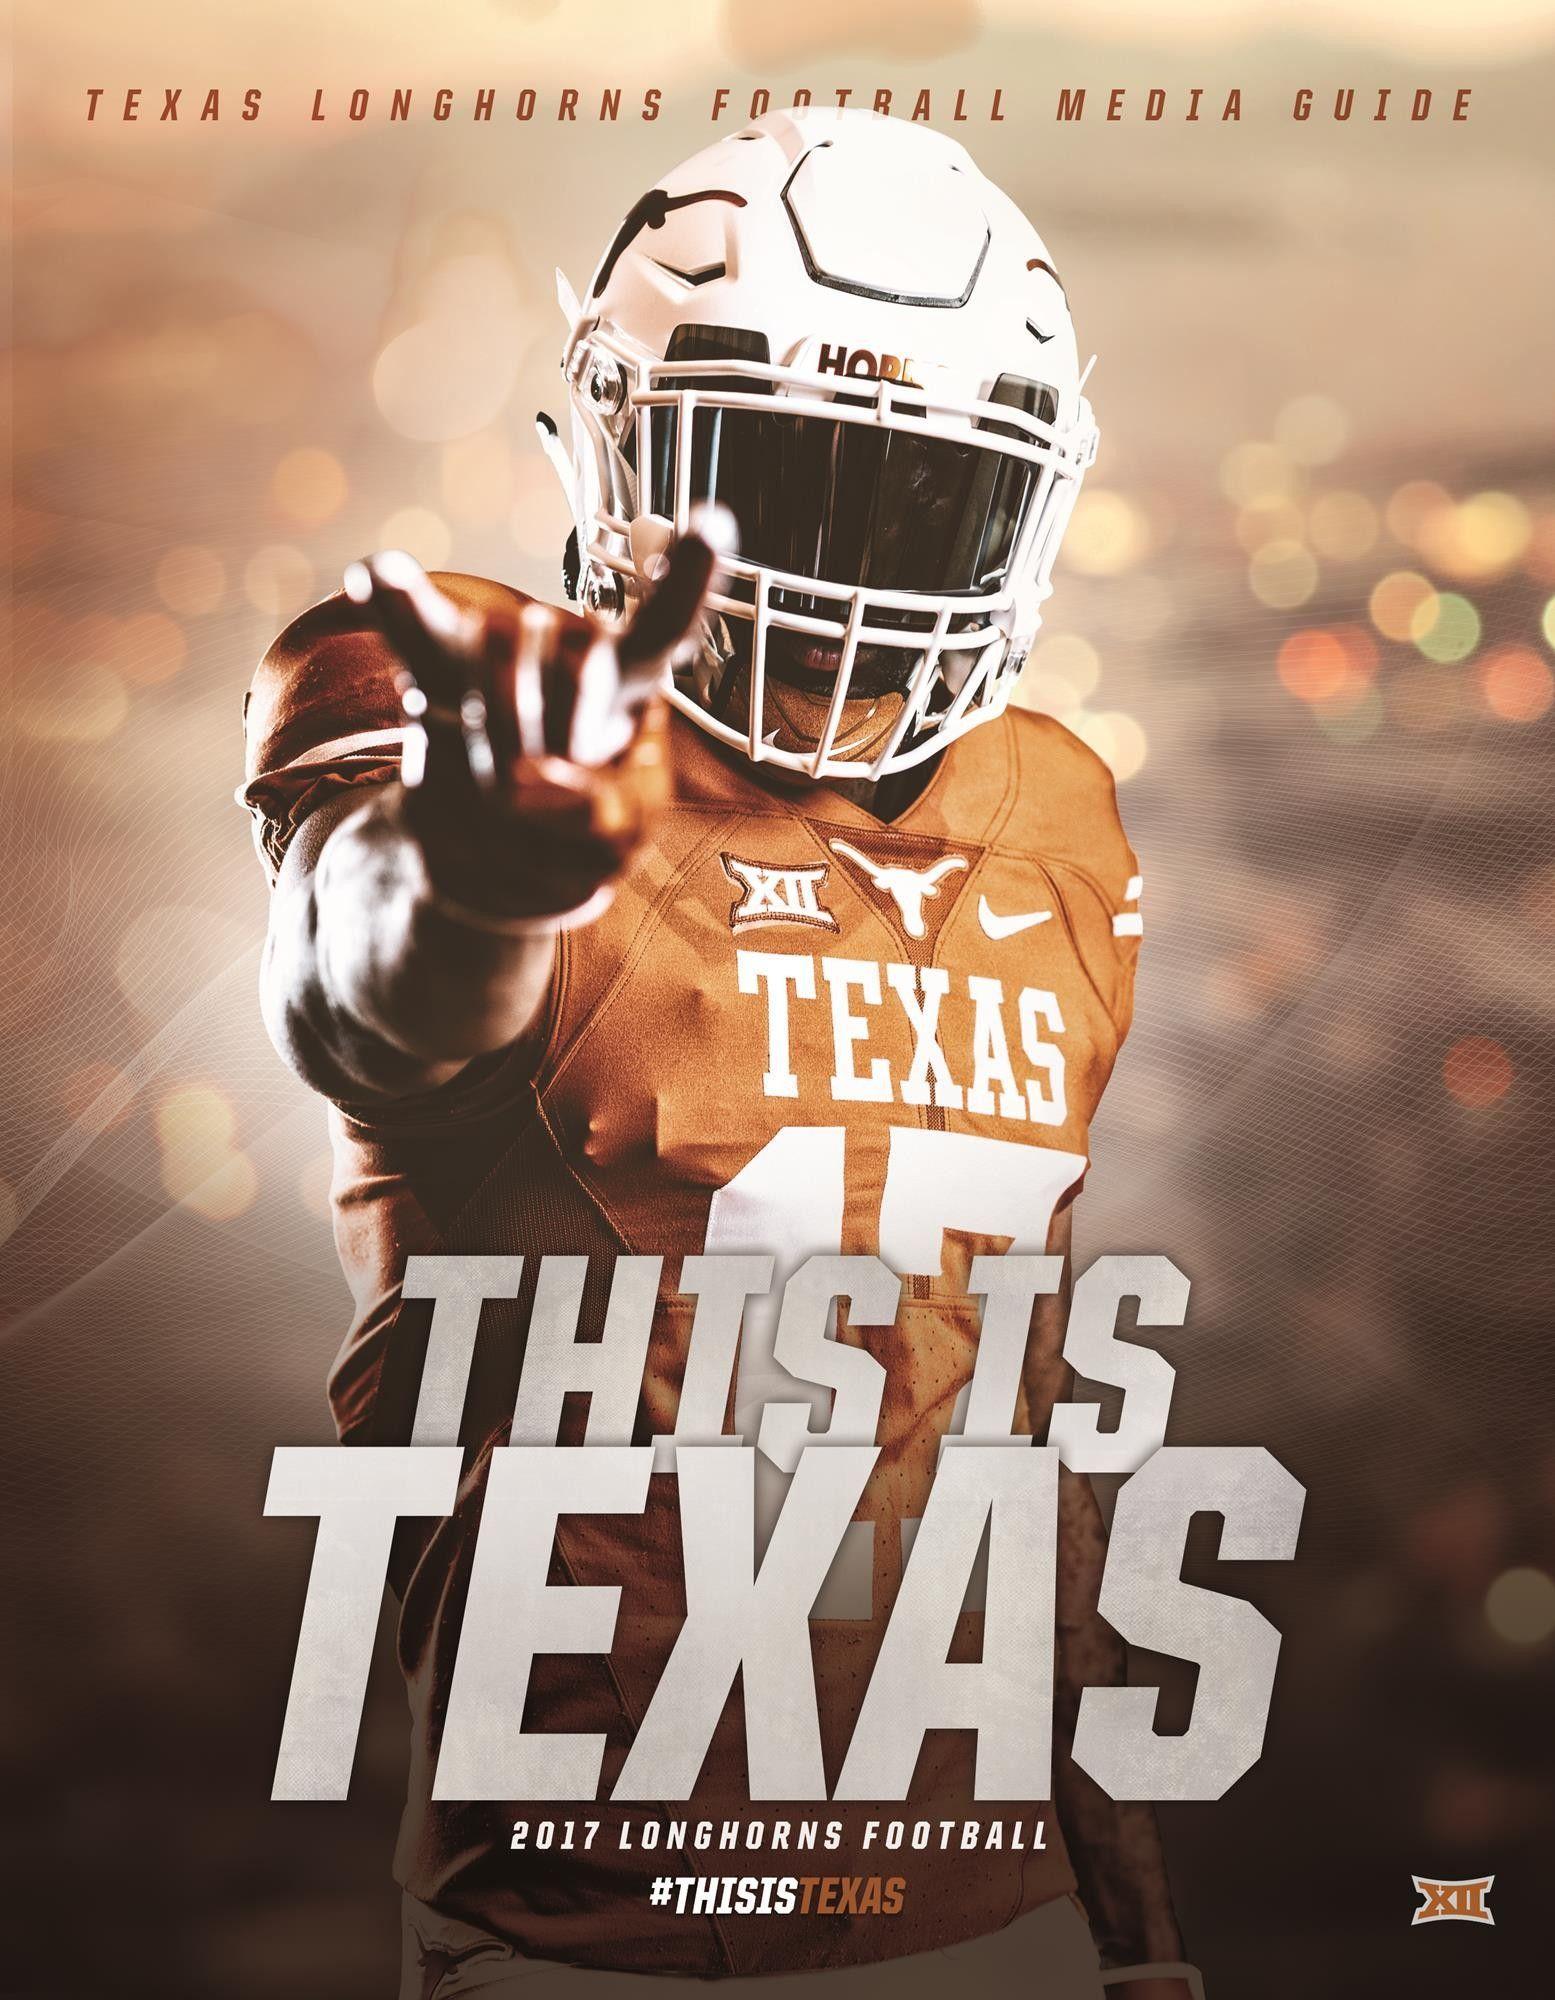 Download wallpapers Texas Longhorns, golden logo, NCAA, orange metal  background, american football club, Texas Longhorns logo, american  football, USA for desktop free ... | 2000x1555